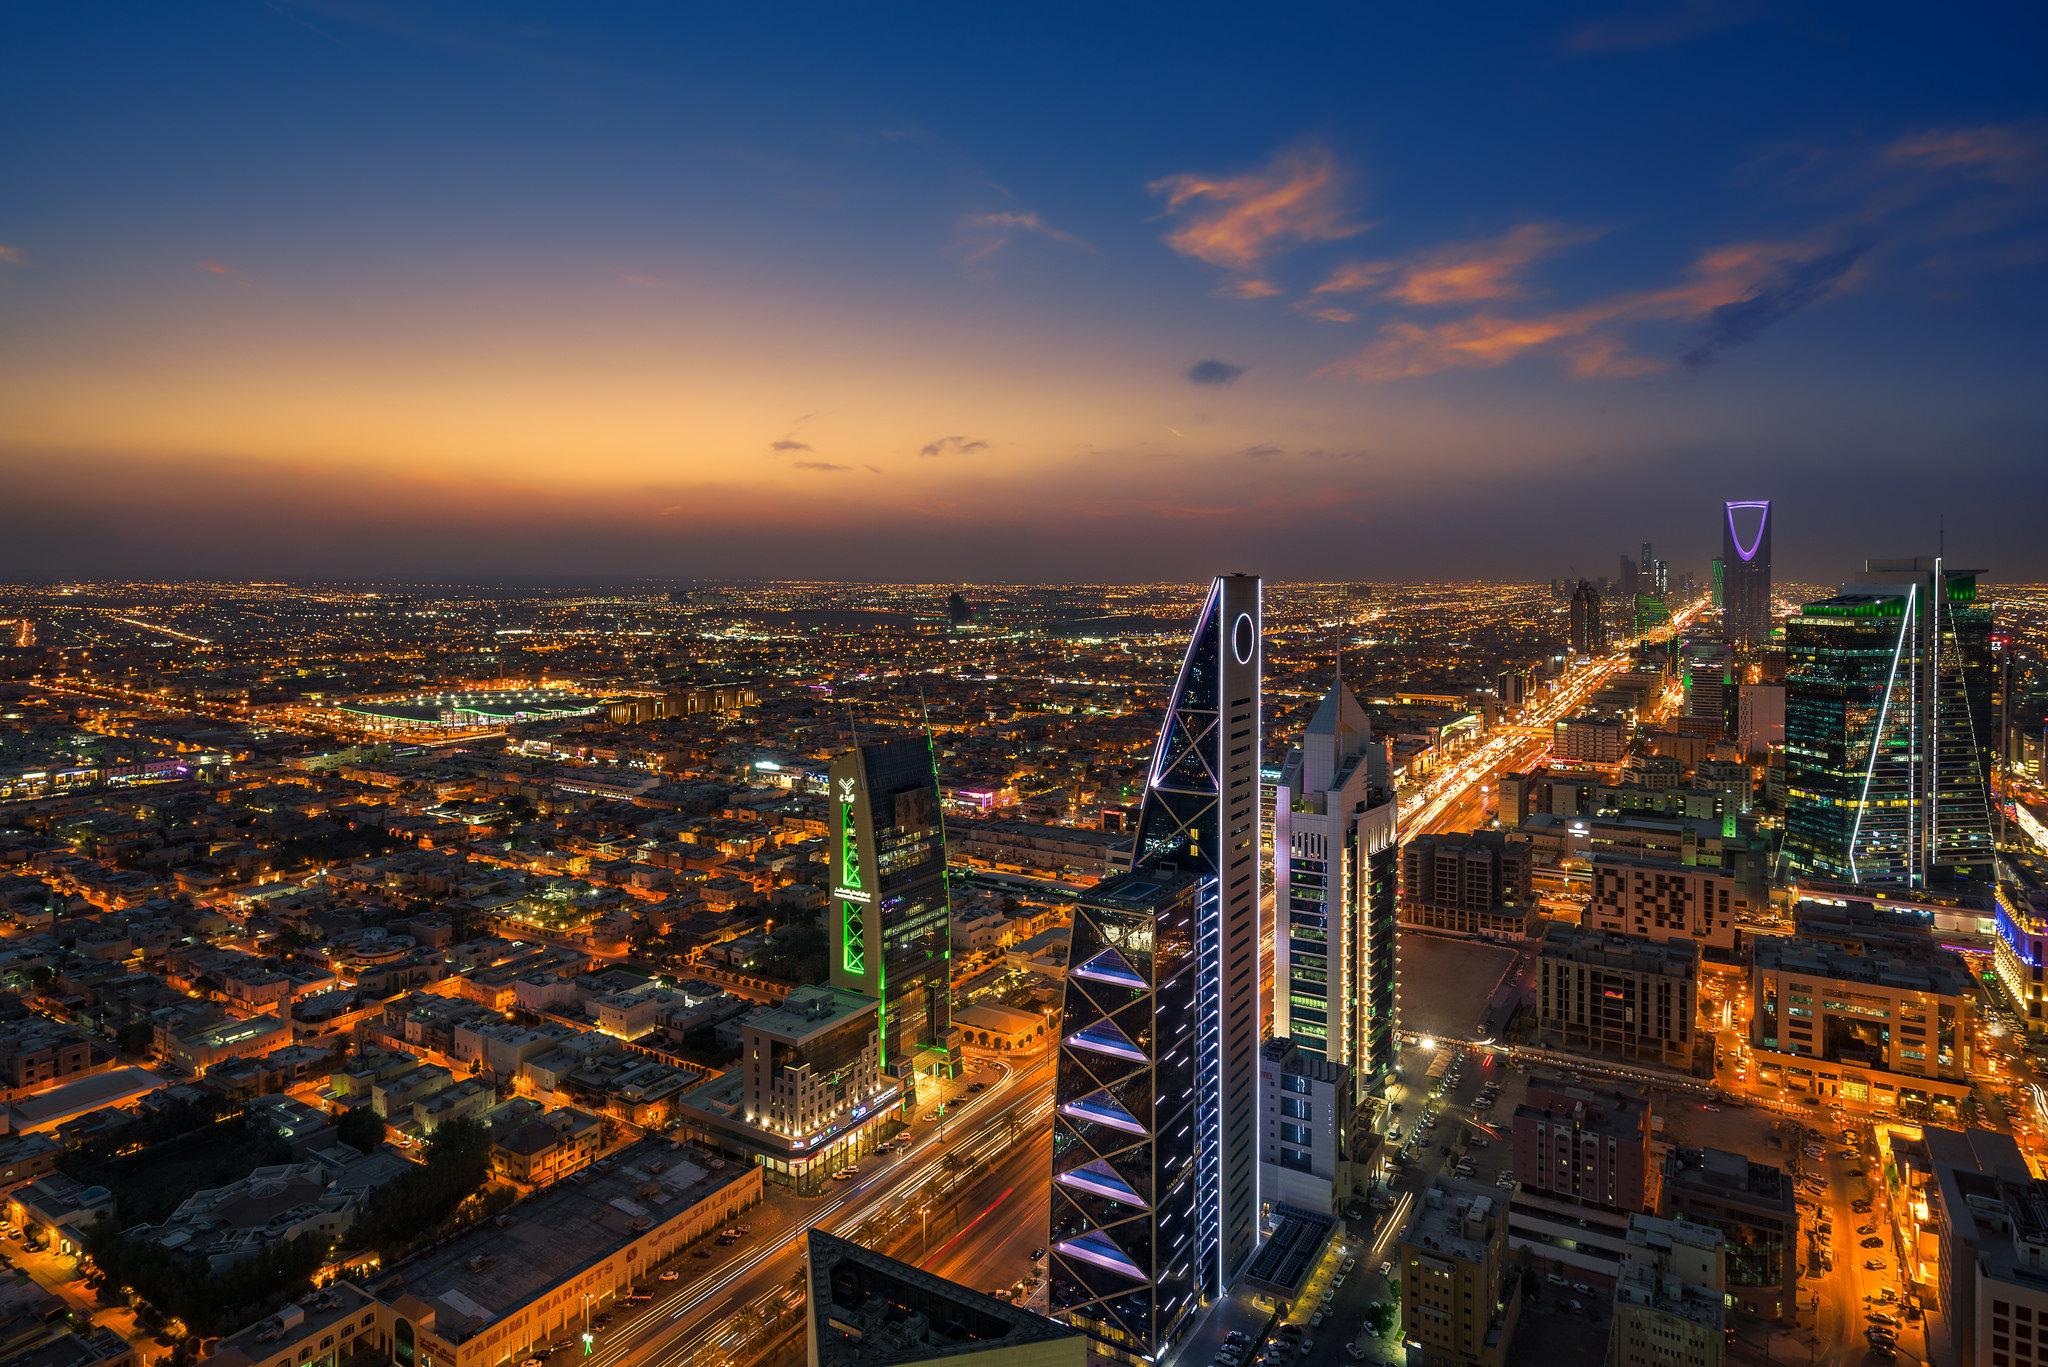 IECHE Riyadh, 2019